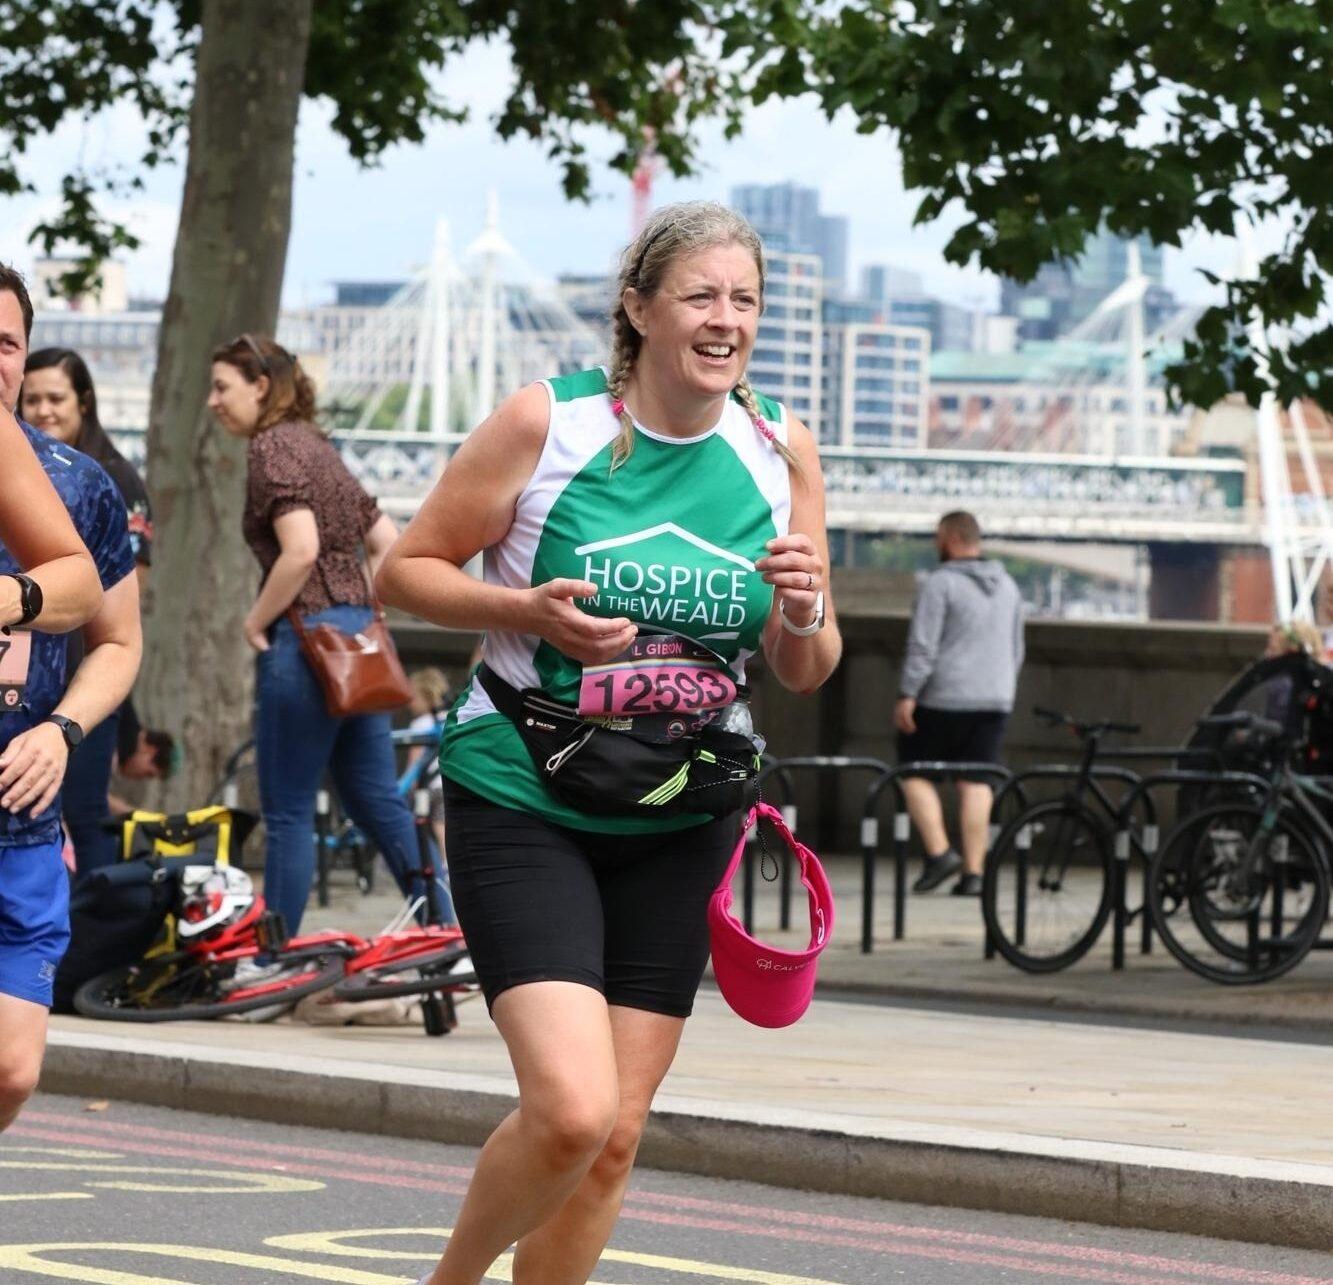 Laura Gibson running the London Landmarks Half Marathon 2021